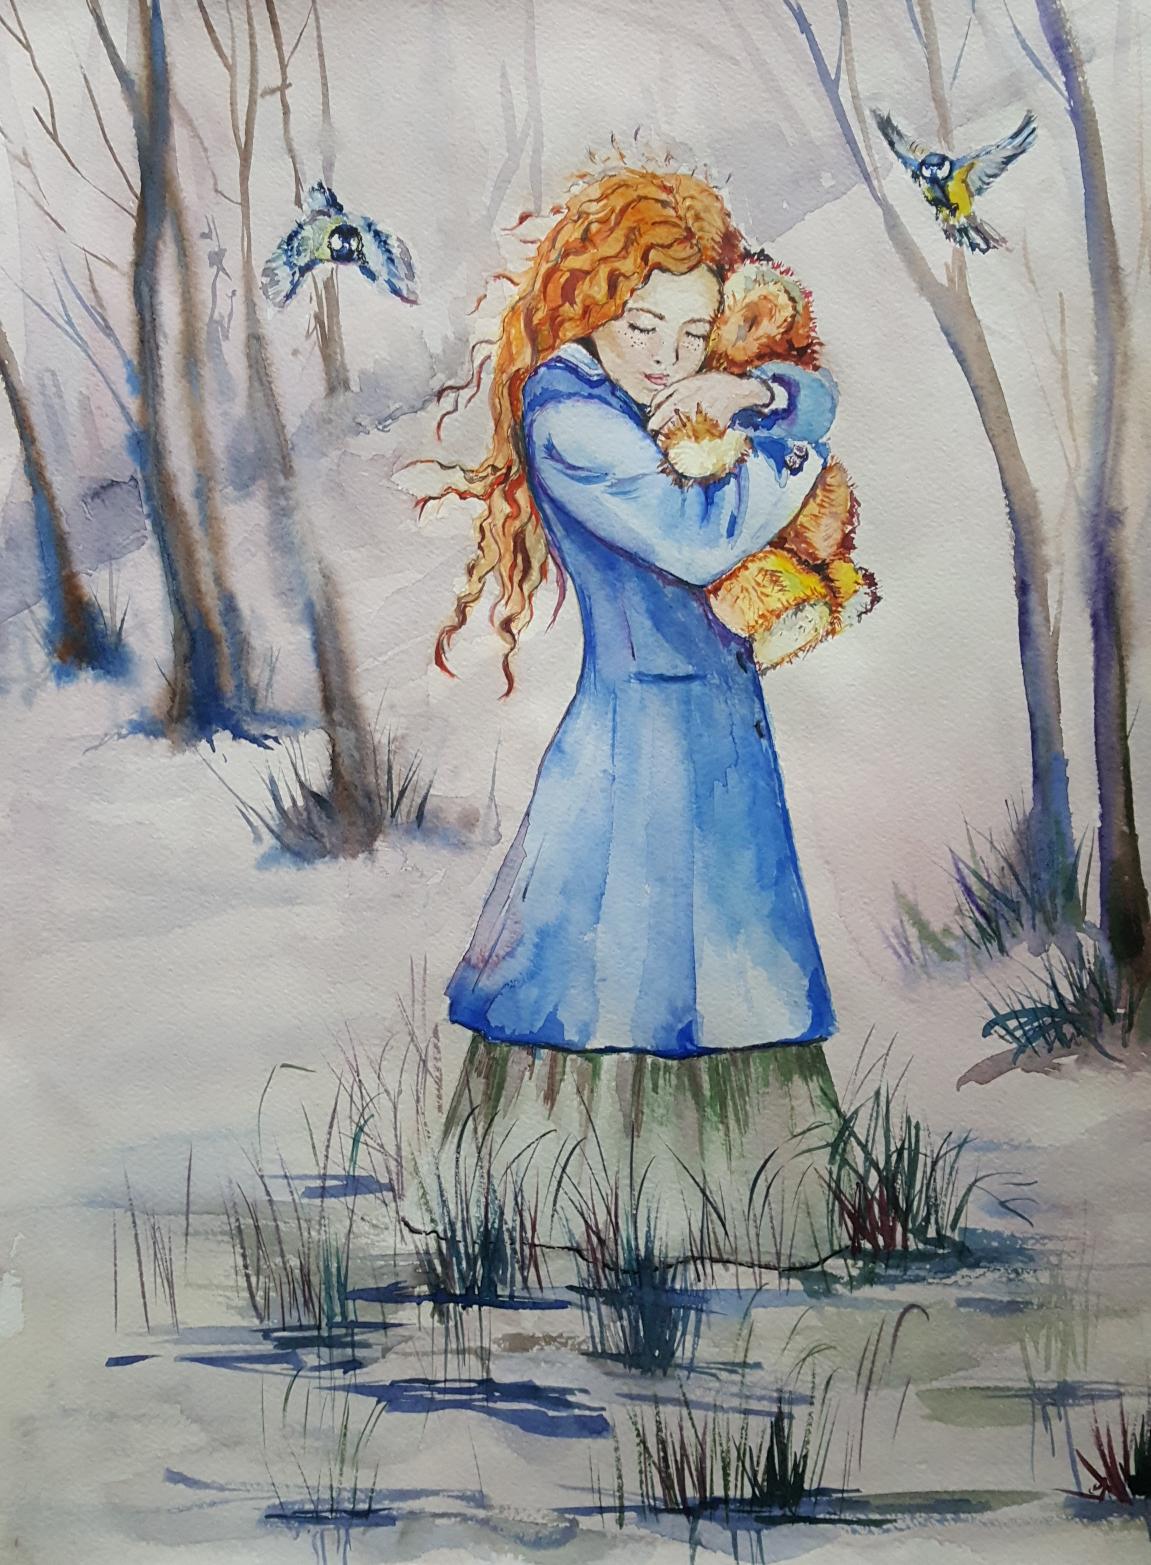 рисунок для прощанья картинки